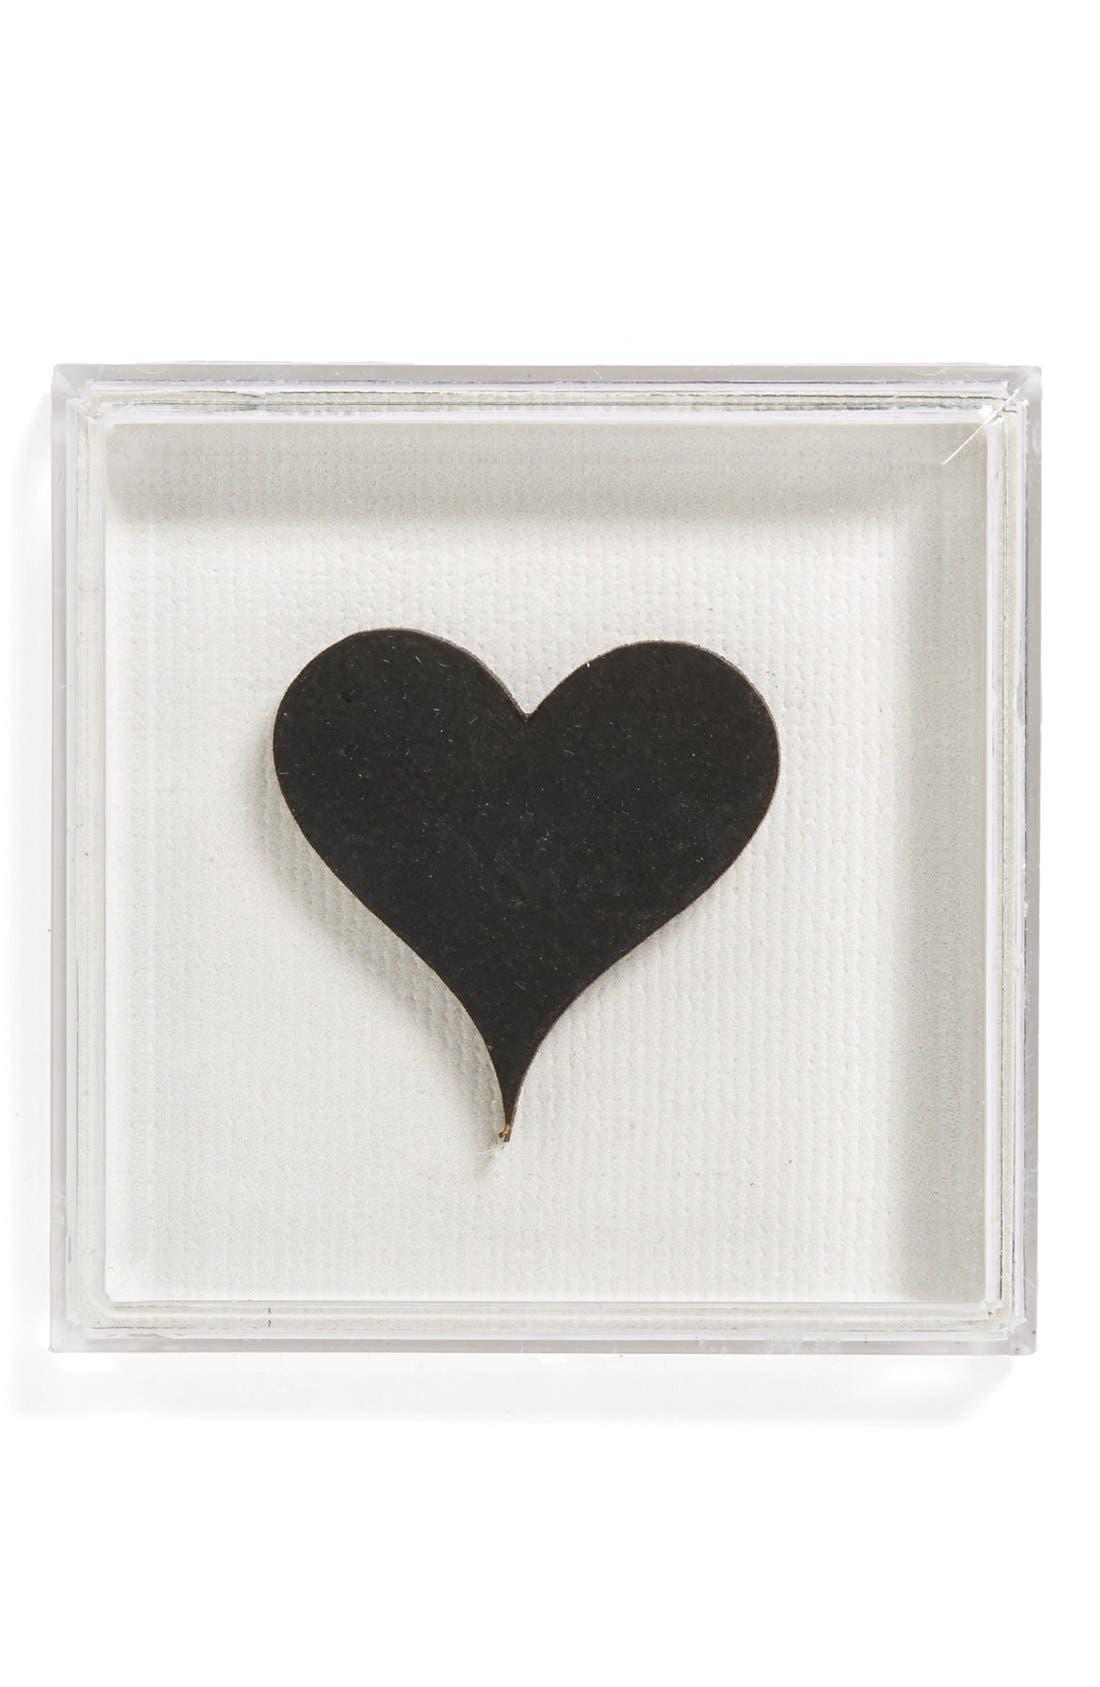 Main Image - Petal Lane 'Heart' Magnet